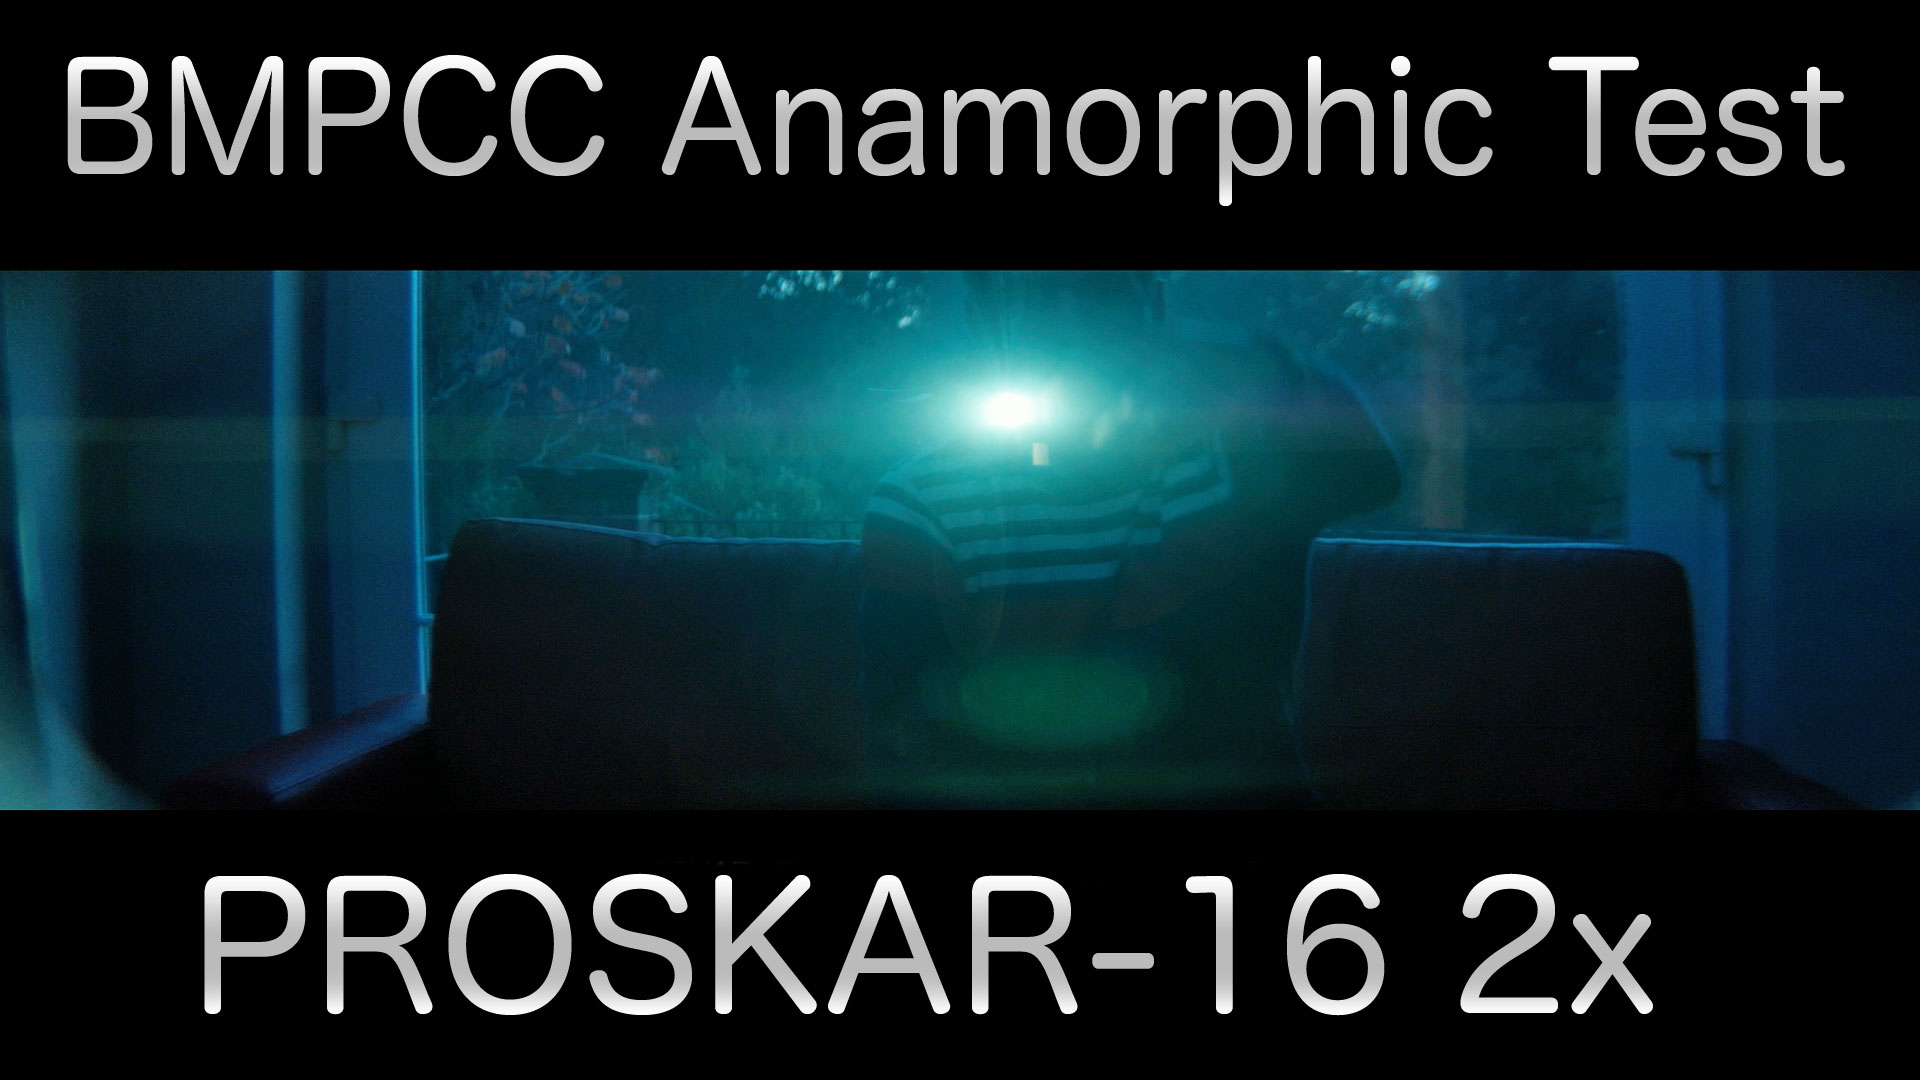 BMPCC Anamorphic Test | Proskar-16 2x